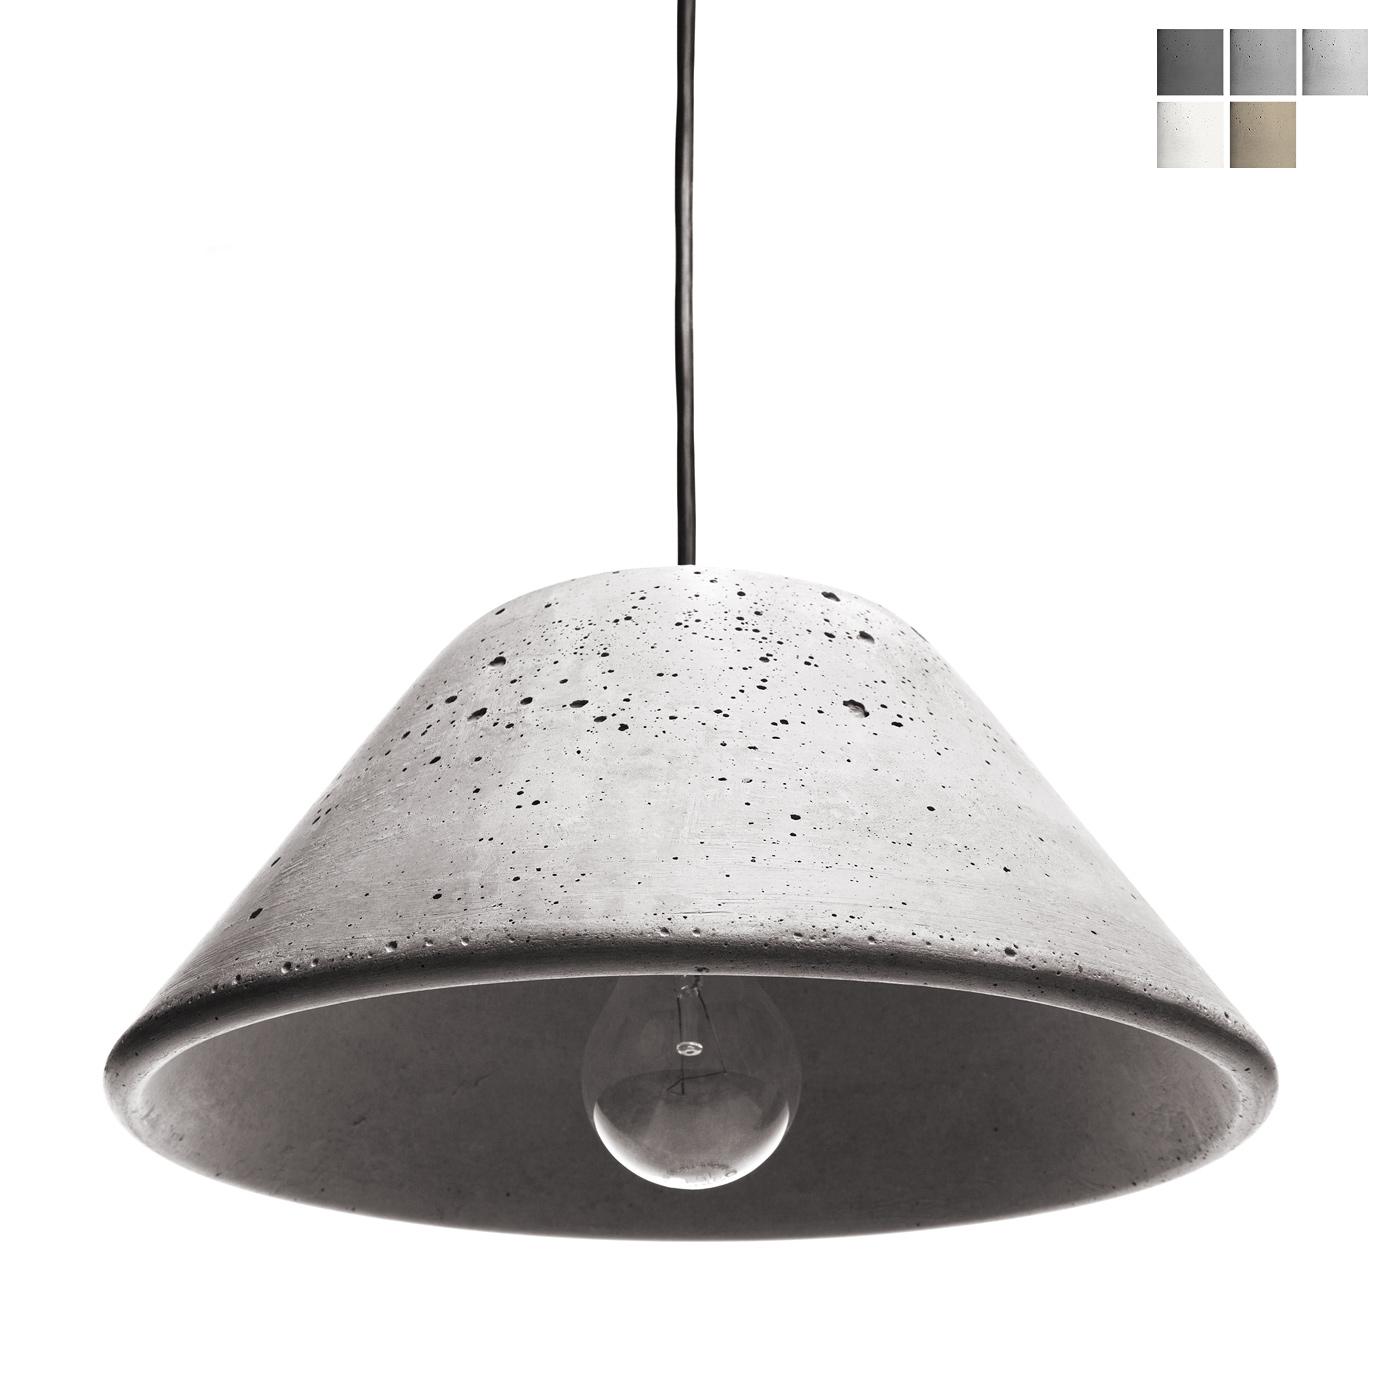 zeitlose pendelleuchte aus beton olympus casa lumi. Black Bedroom Furniture Sets. Home Design Ideas